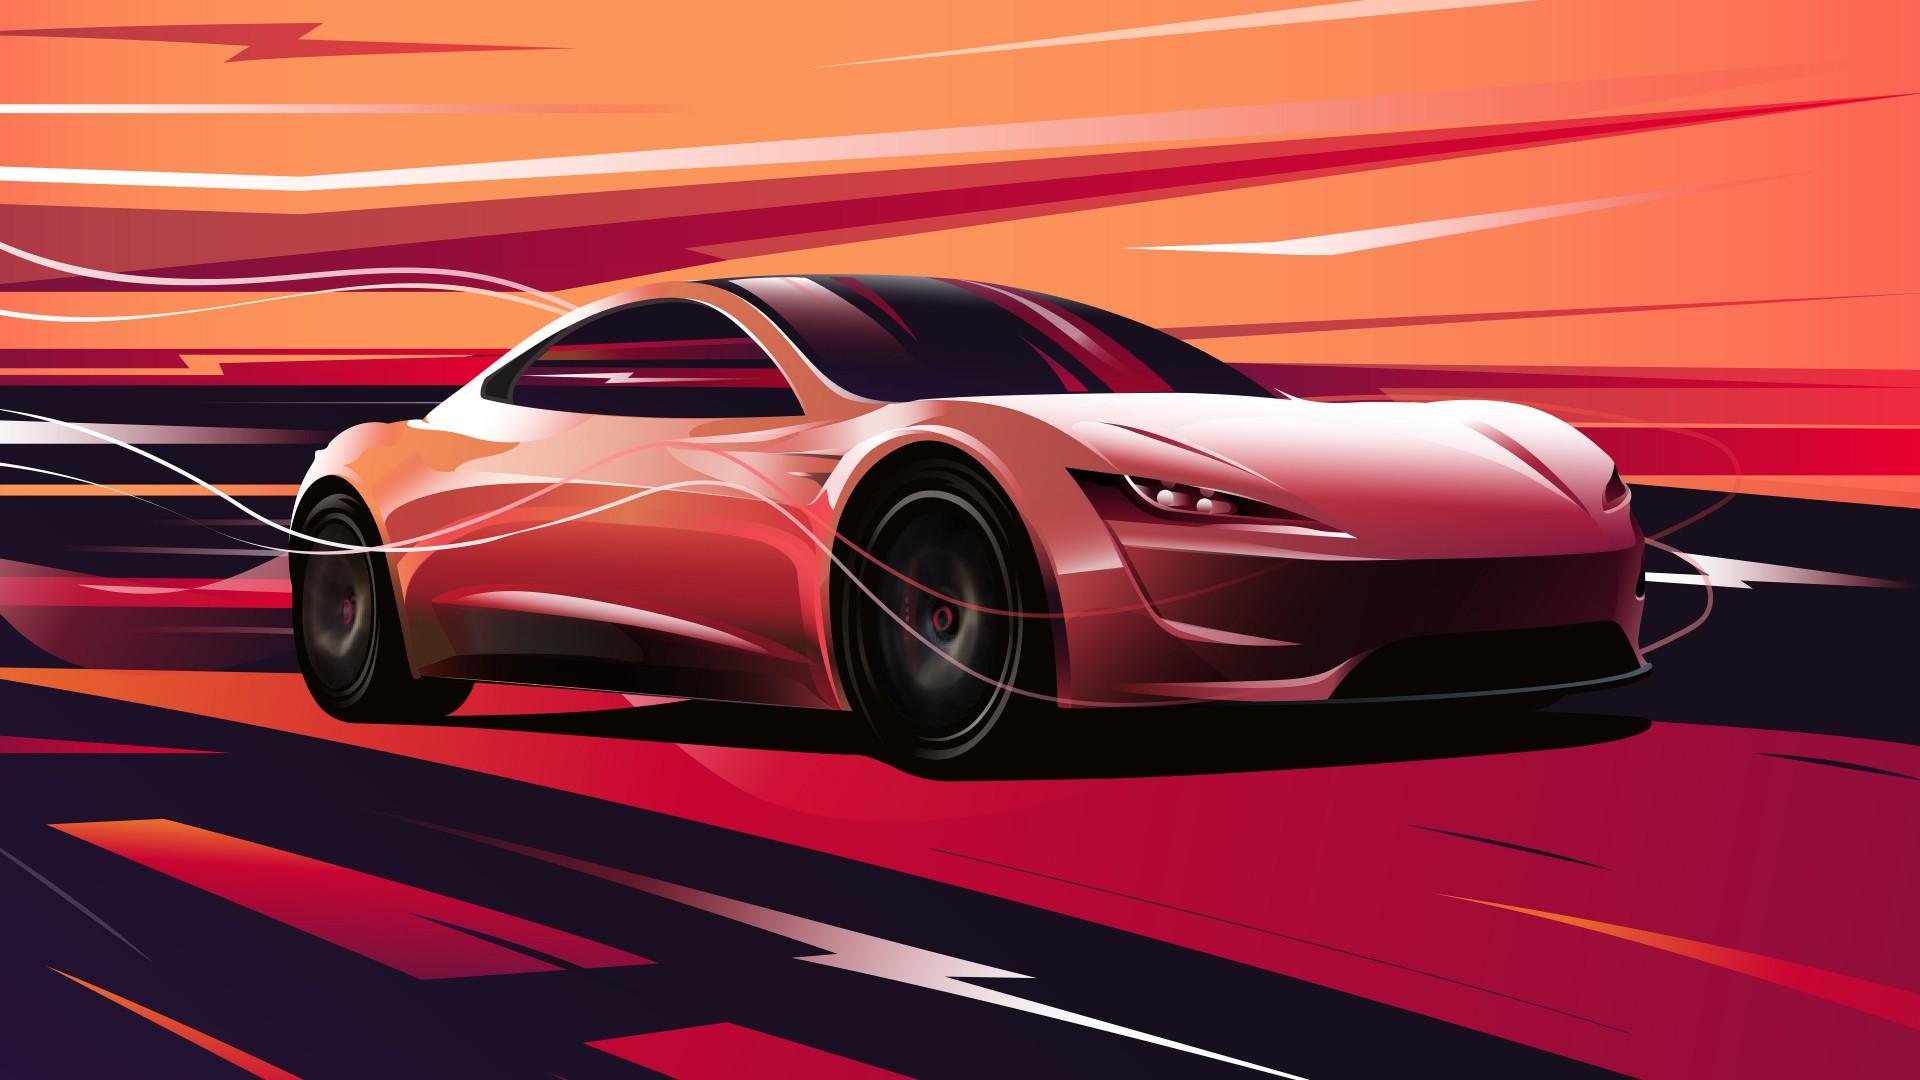 3d Graphic Wallpaper Hd Tesla Roadster 2020 4k 8k Wallpapers Hd Wallpapers Id